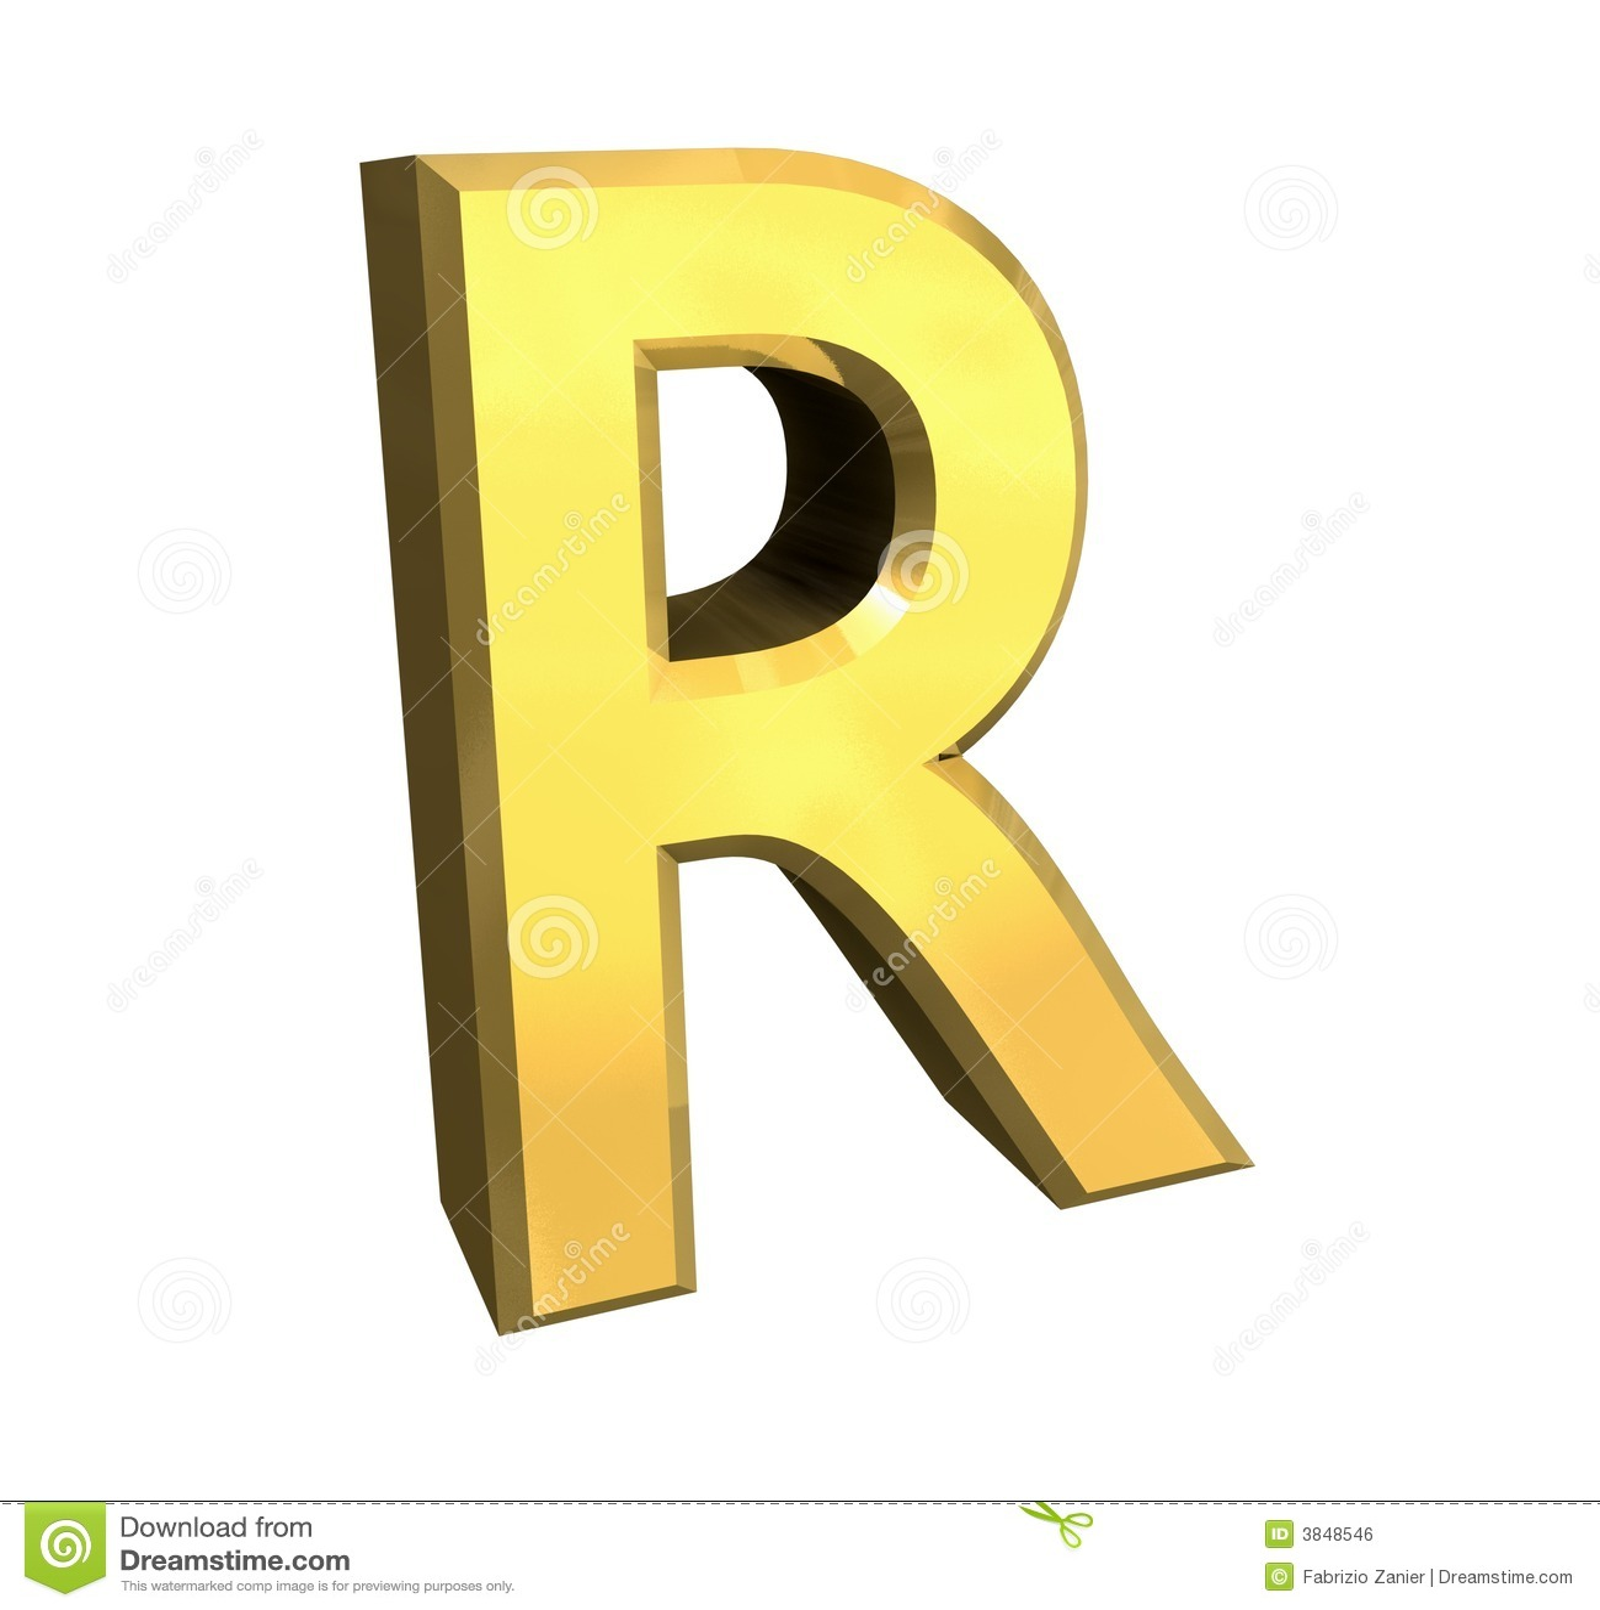 Letter R Images 3d Images Gold 3d letter R